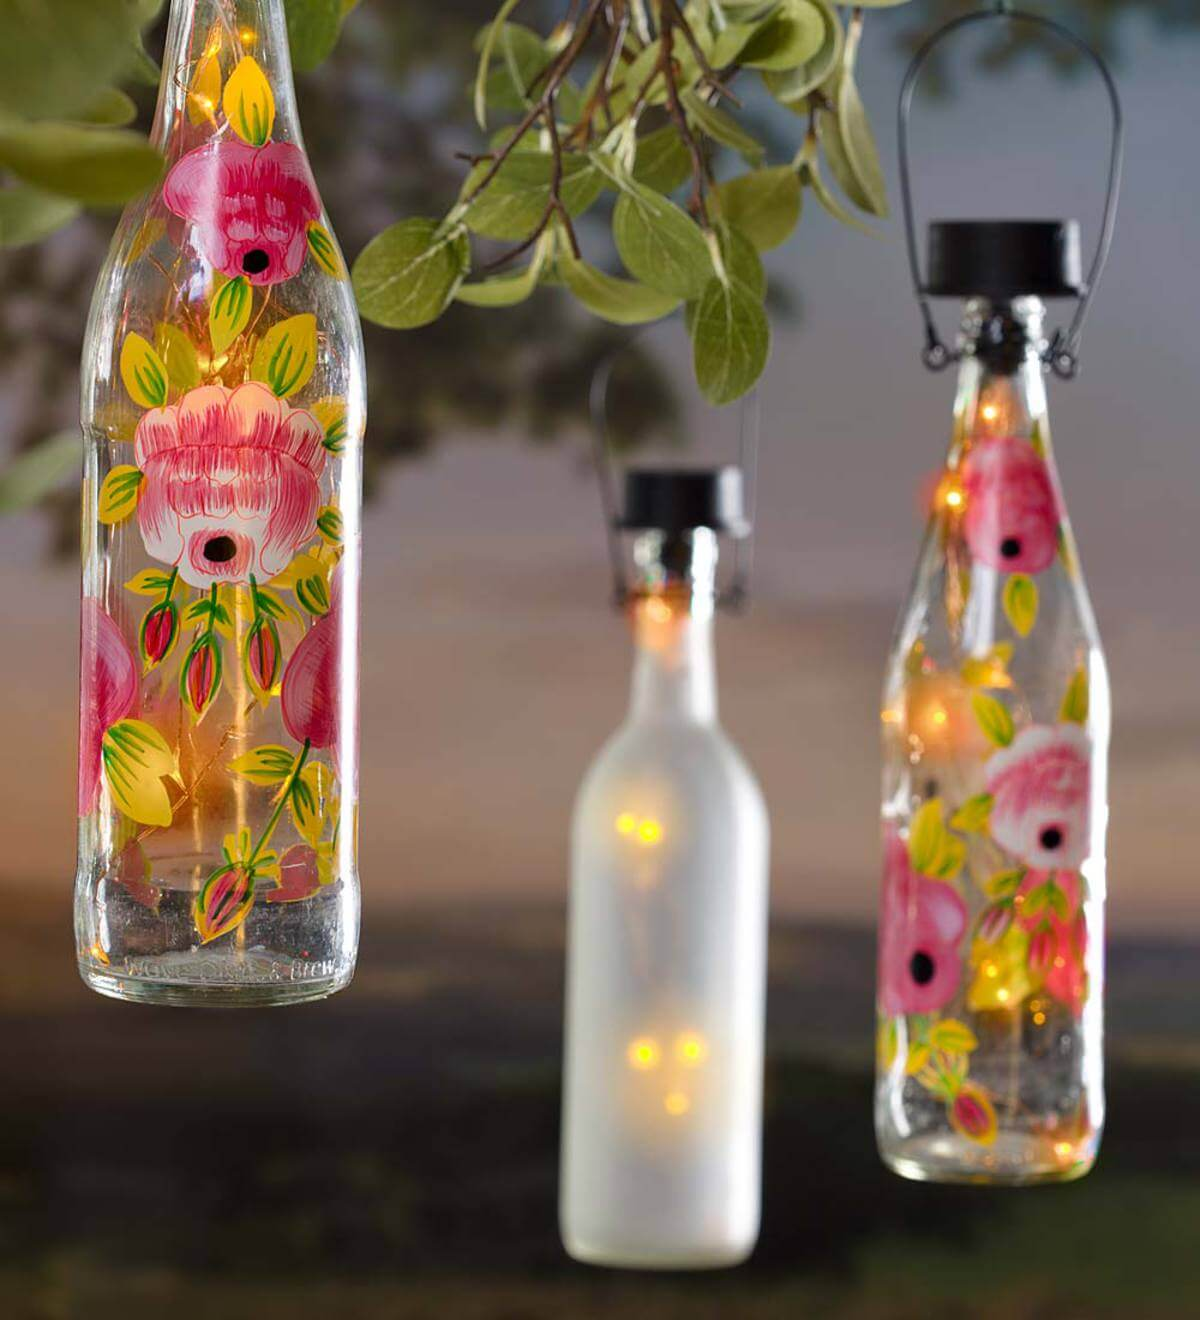 Hanging Solar Bottles Turned Lanterns